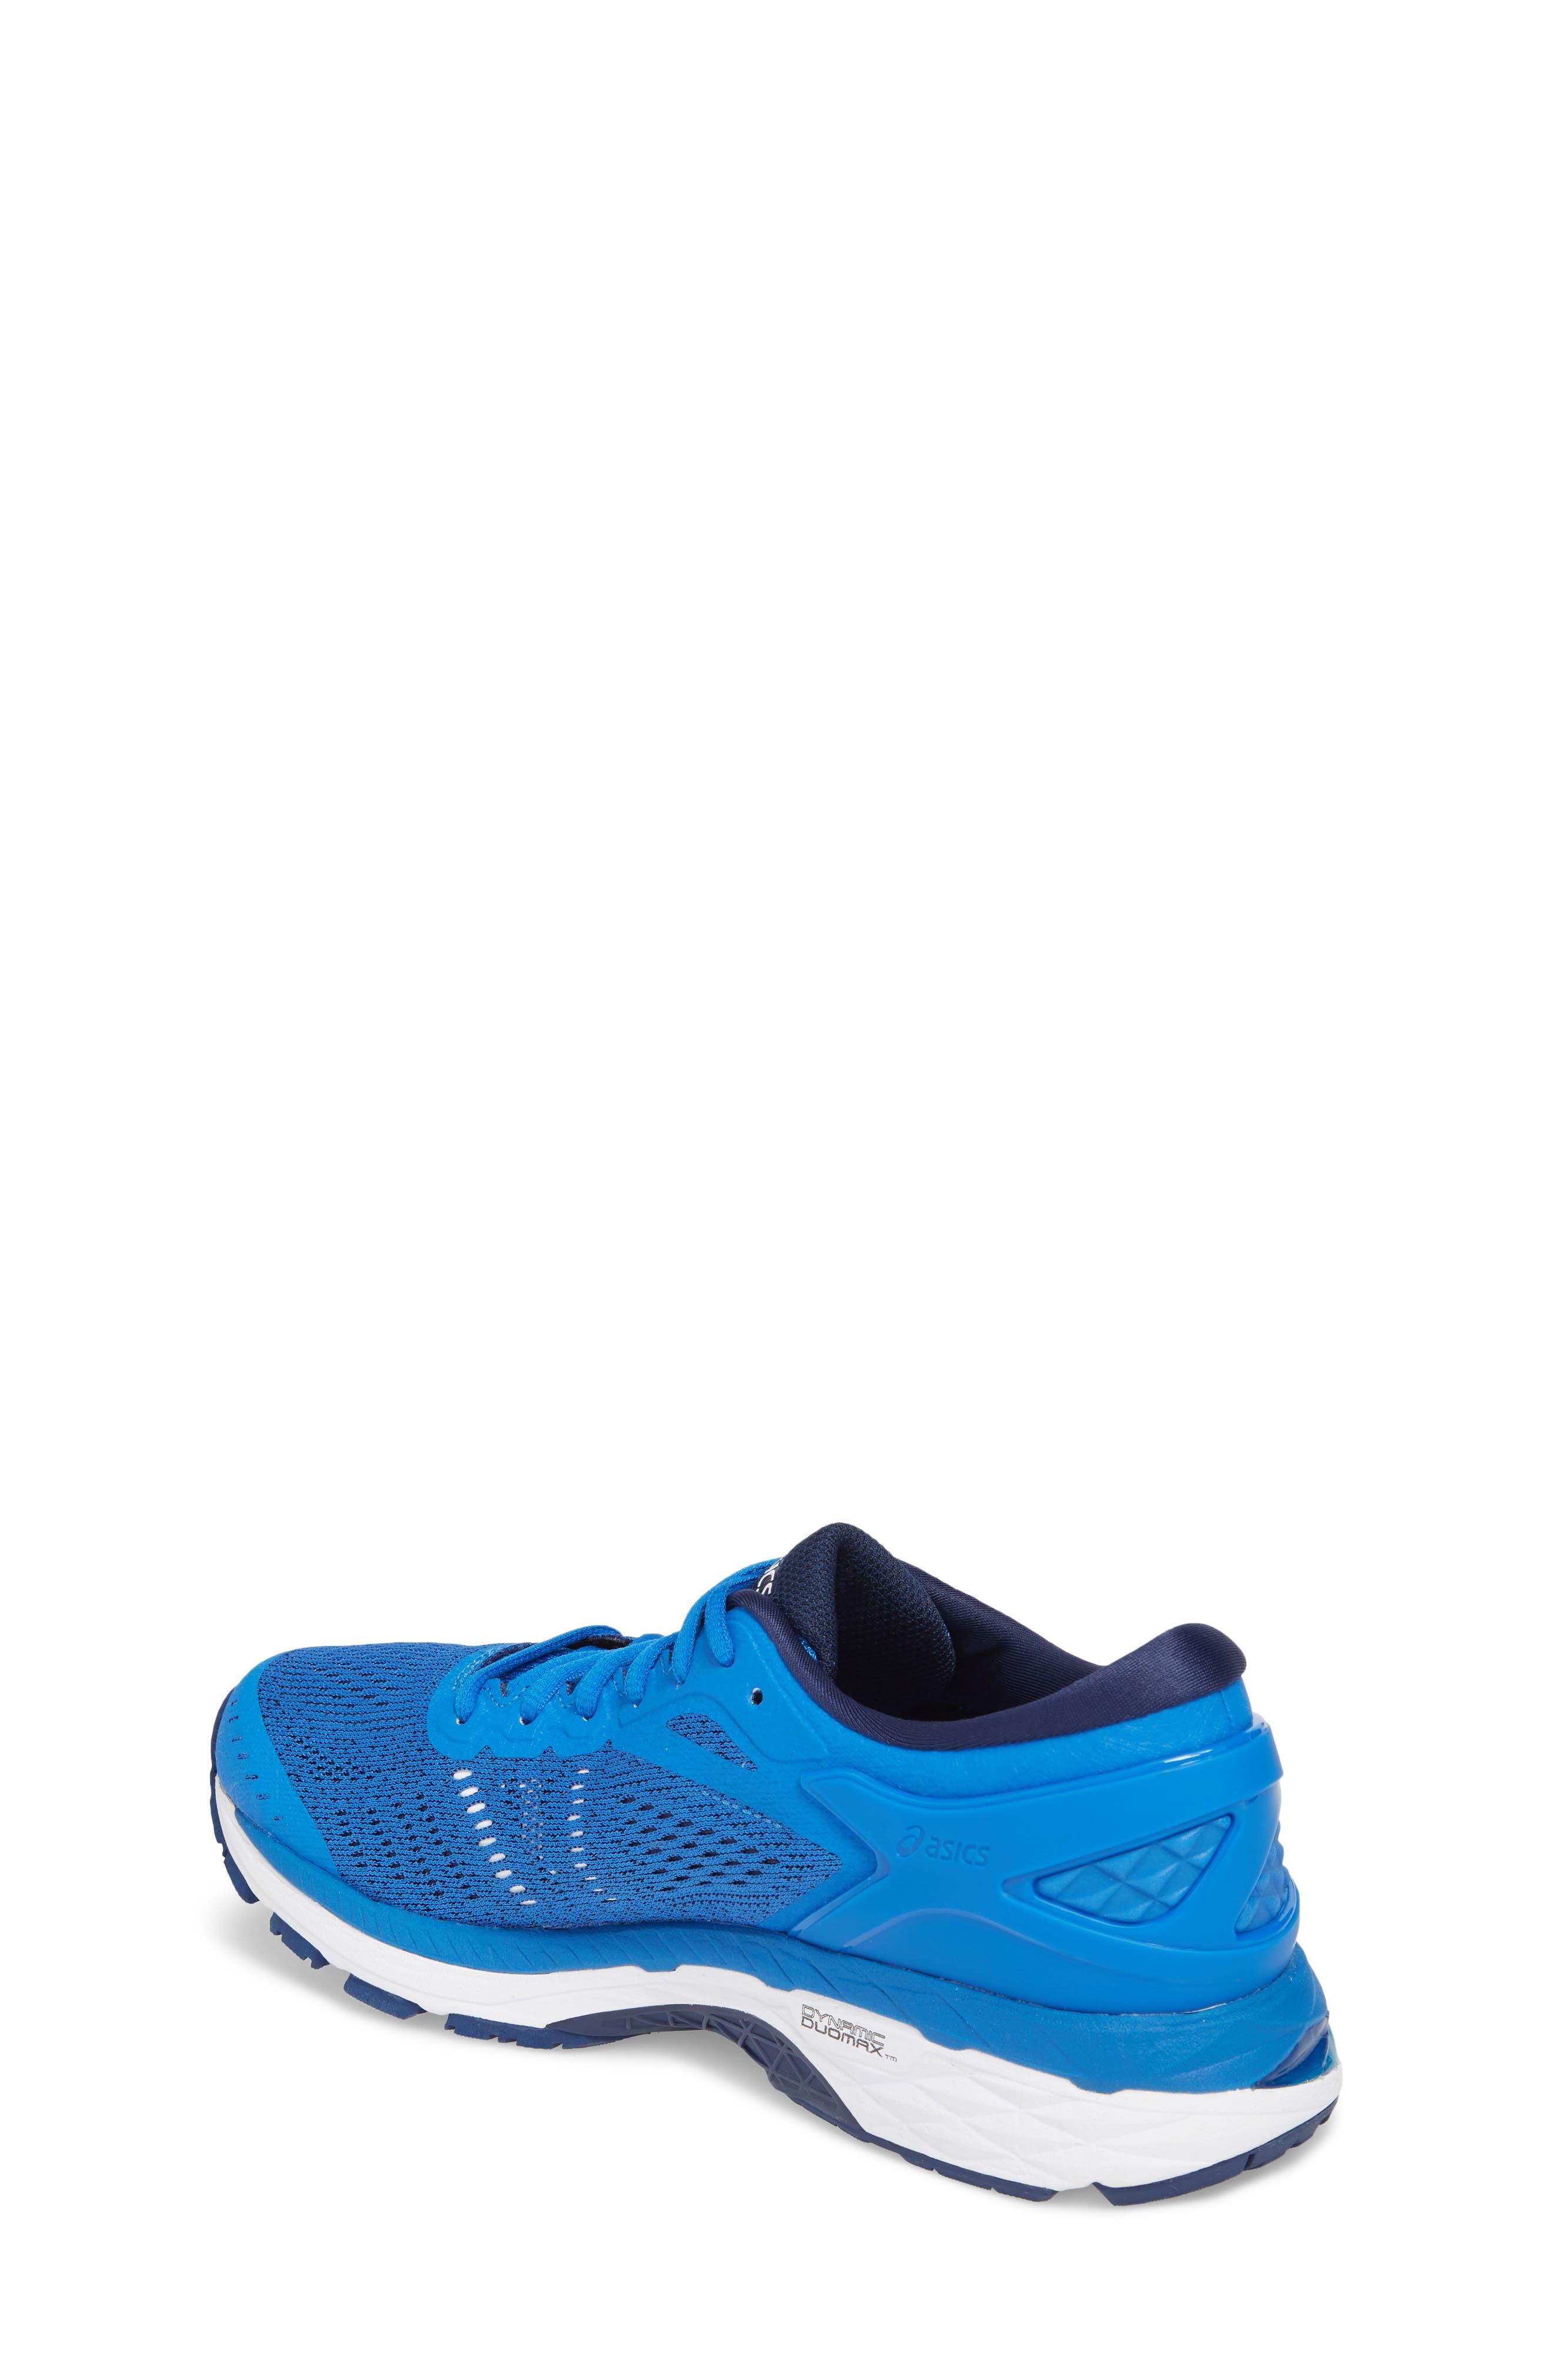 GEL-Kayano<sup>®</sup> 24 GS Running Shoe,                             Alternate thumbnail 3, color,